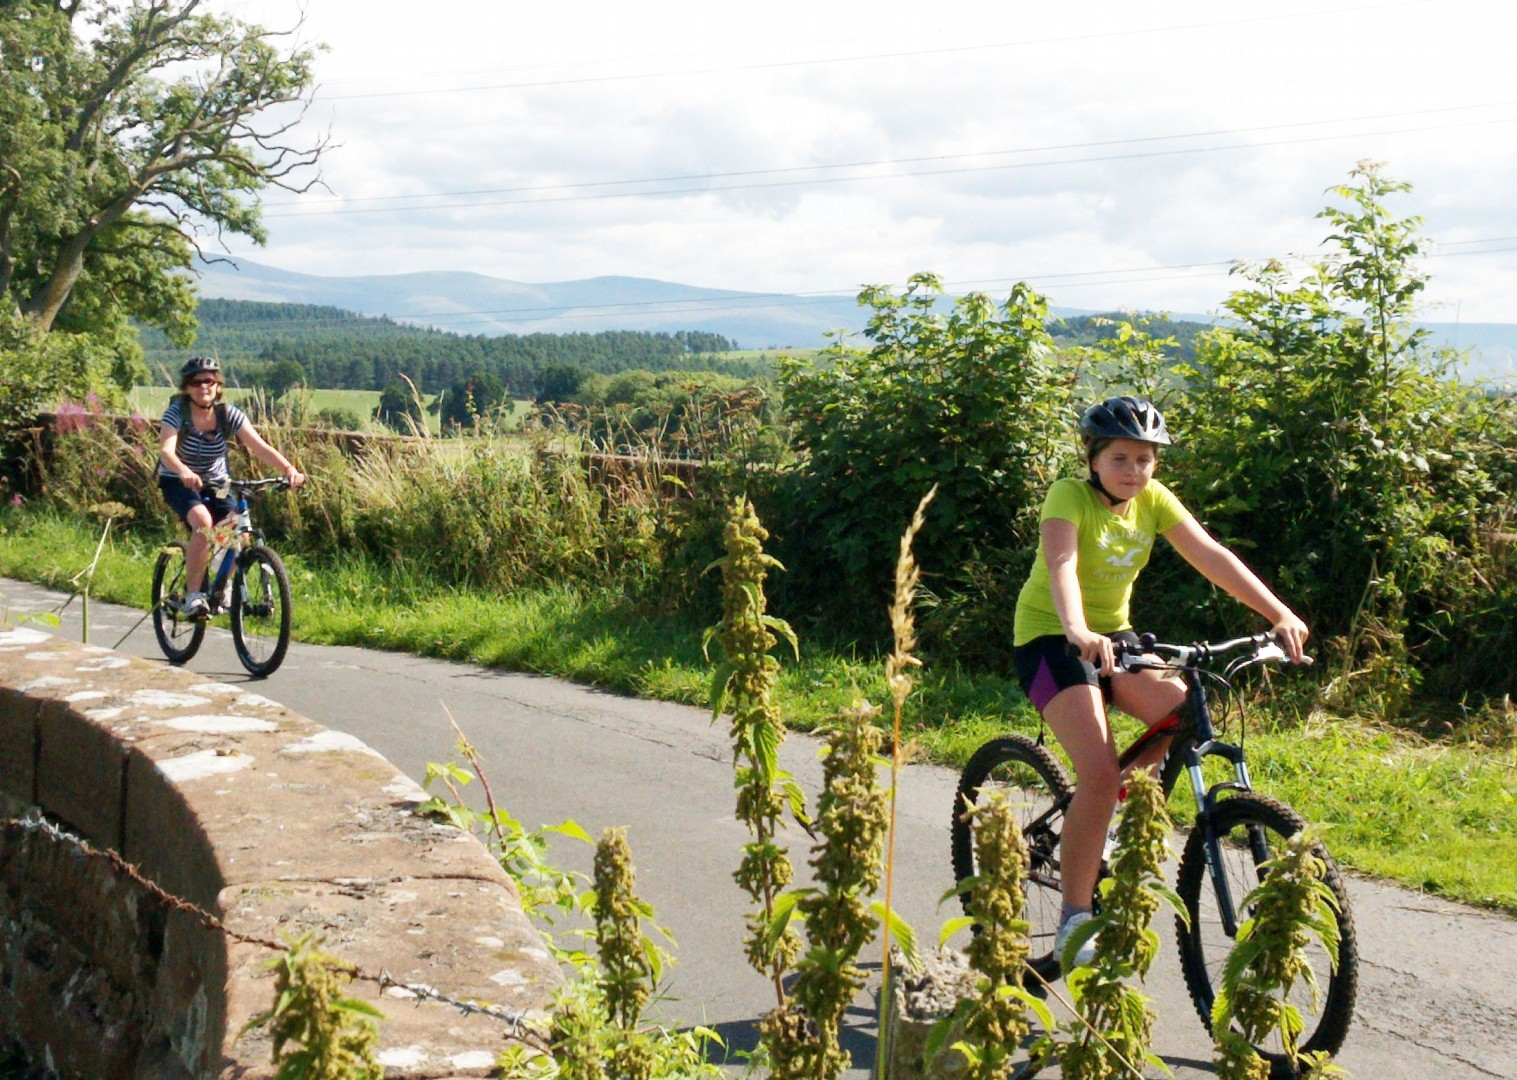 lake-district-cycling-family.jpg - UK - Lake District - Bike Skills - Family Cycling